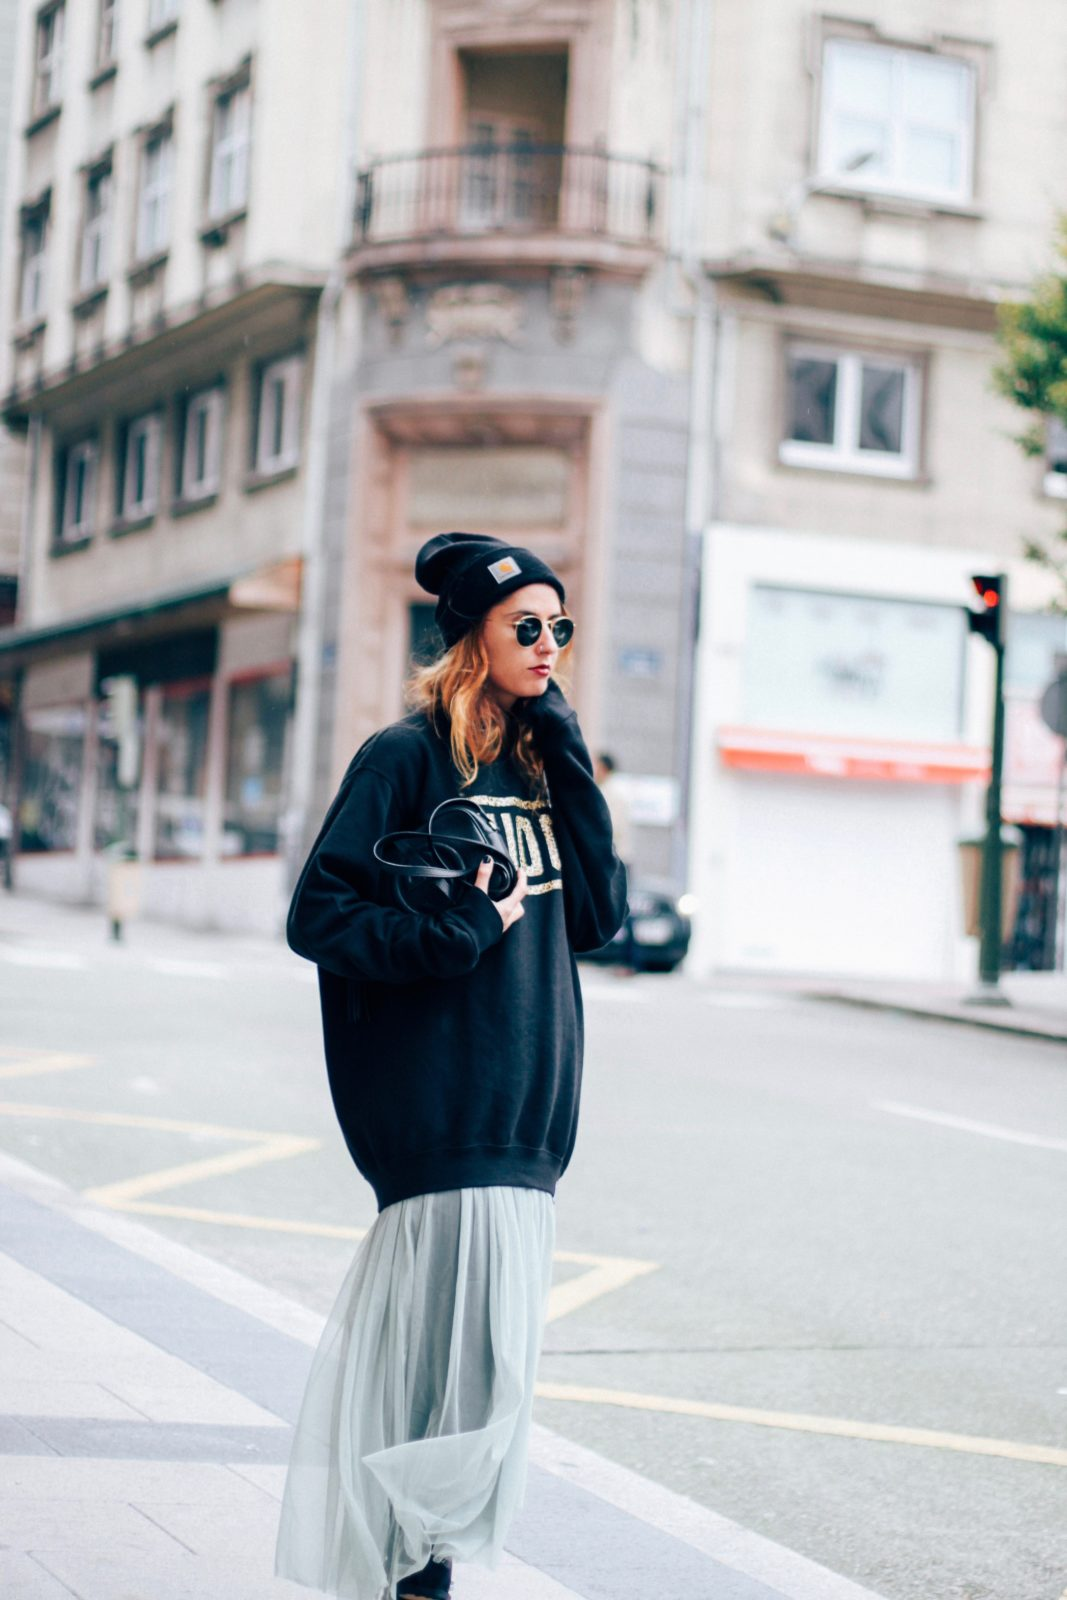 sudadera_old_dogs_falda_de_tul_vans_beanie_carhartt_look_donkeycool_street_style-19